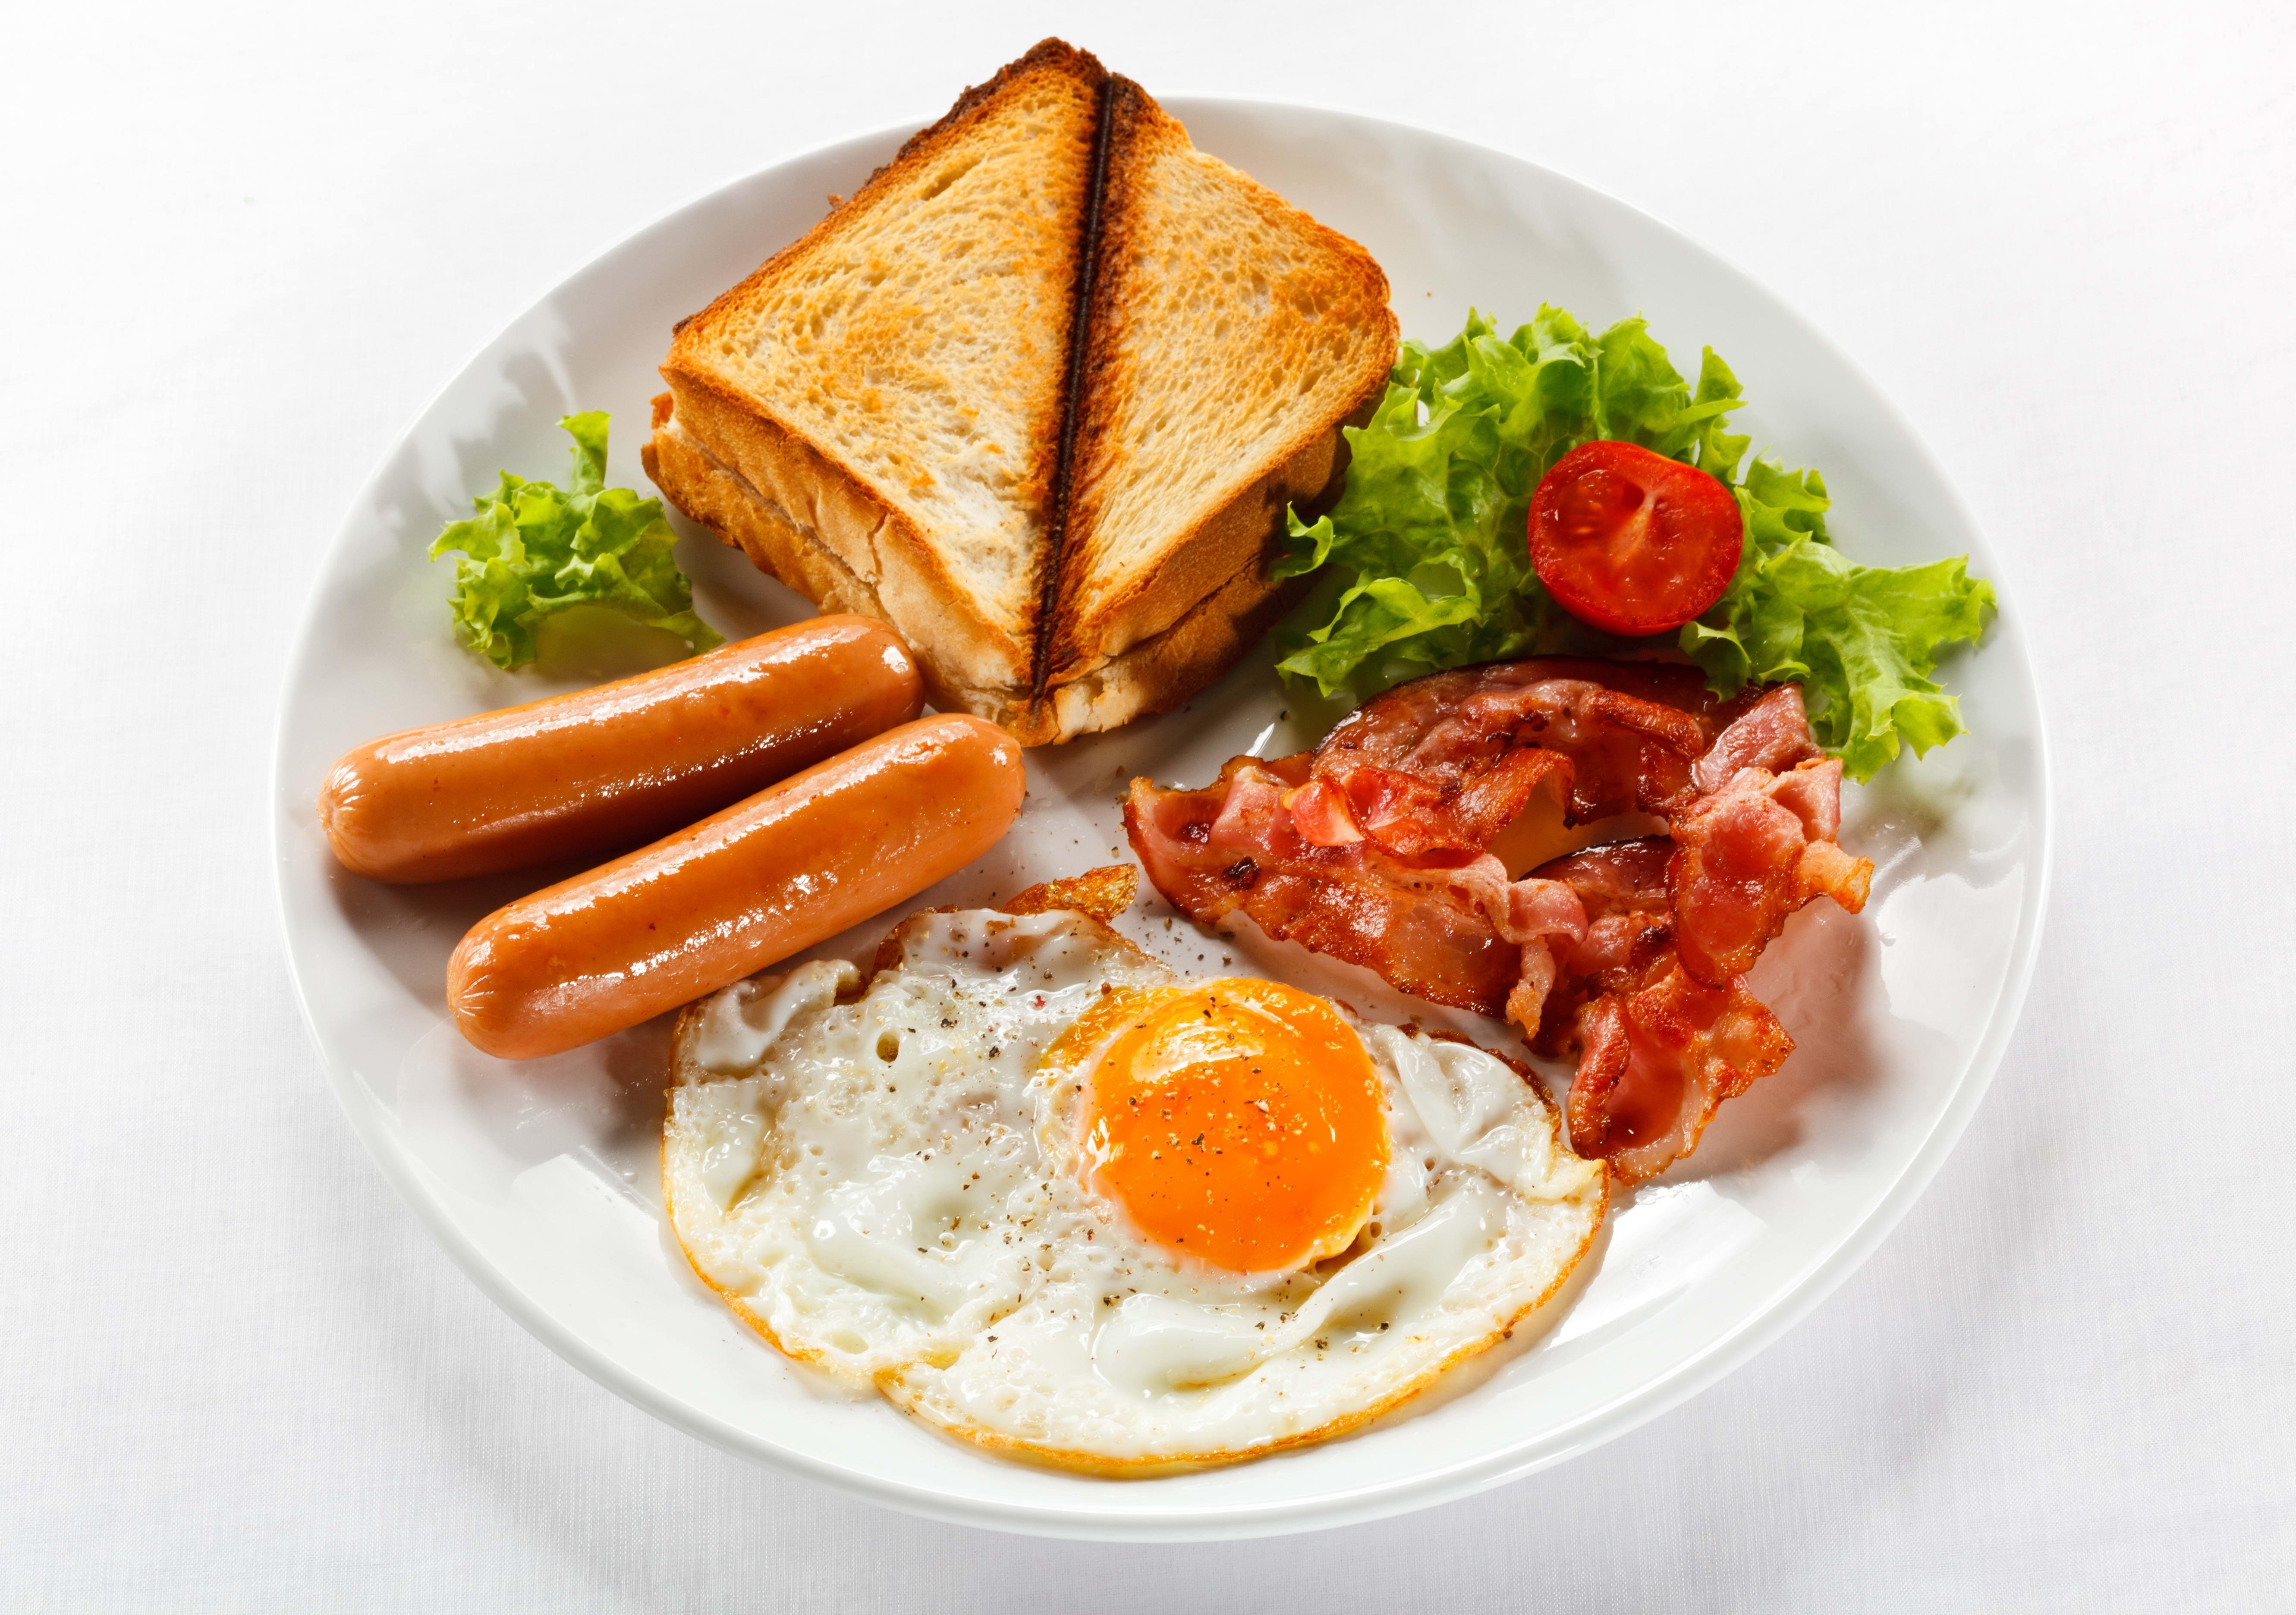 wallpapers breakfast food: Breakfast 5k Retina Ultra HD Wallpaper